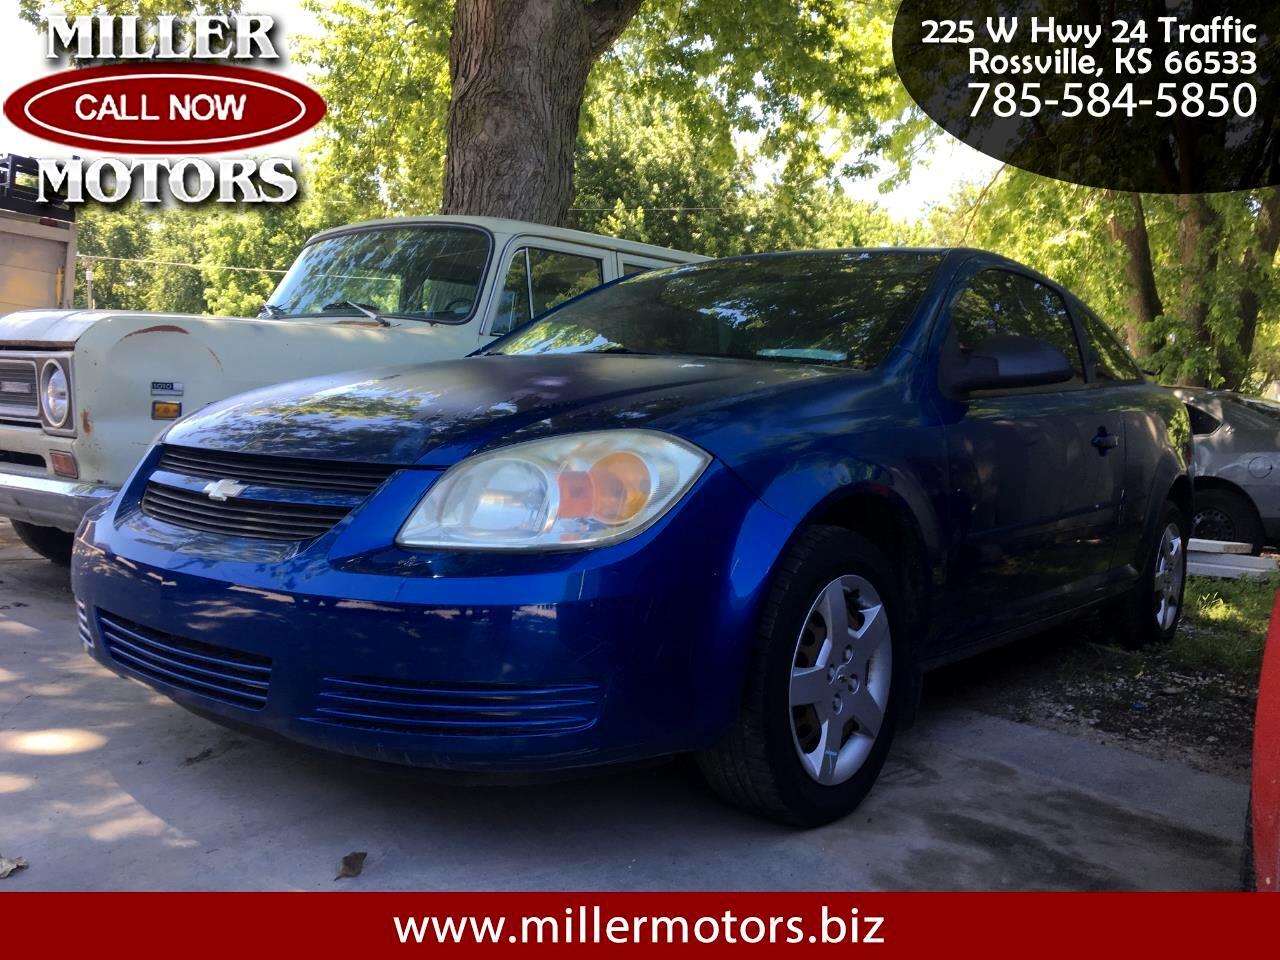 Chevrolet Cobalt 2dr Cpe 2005